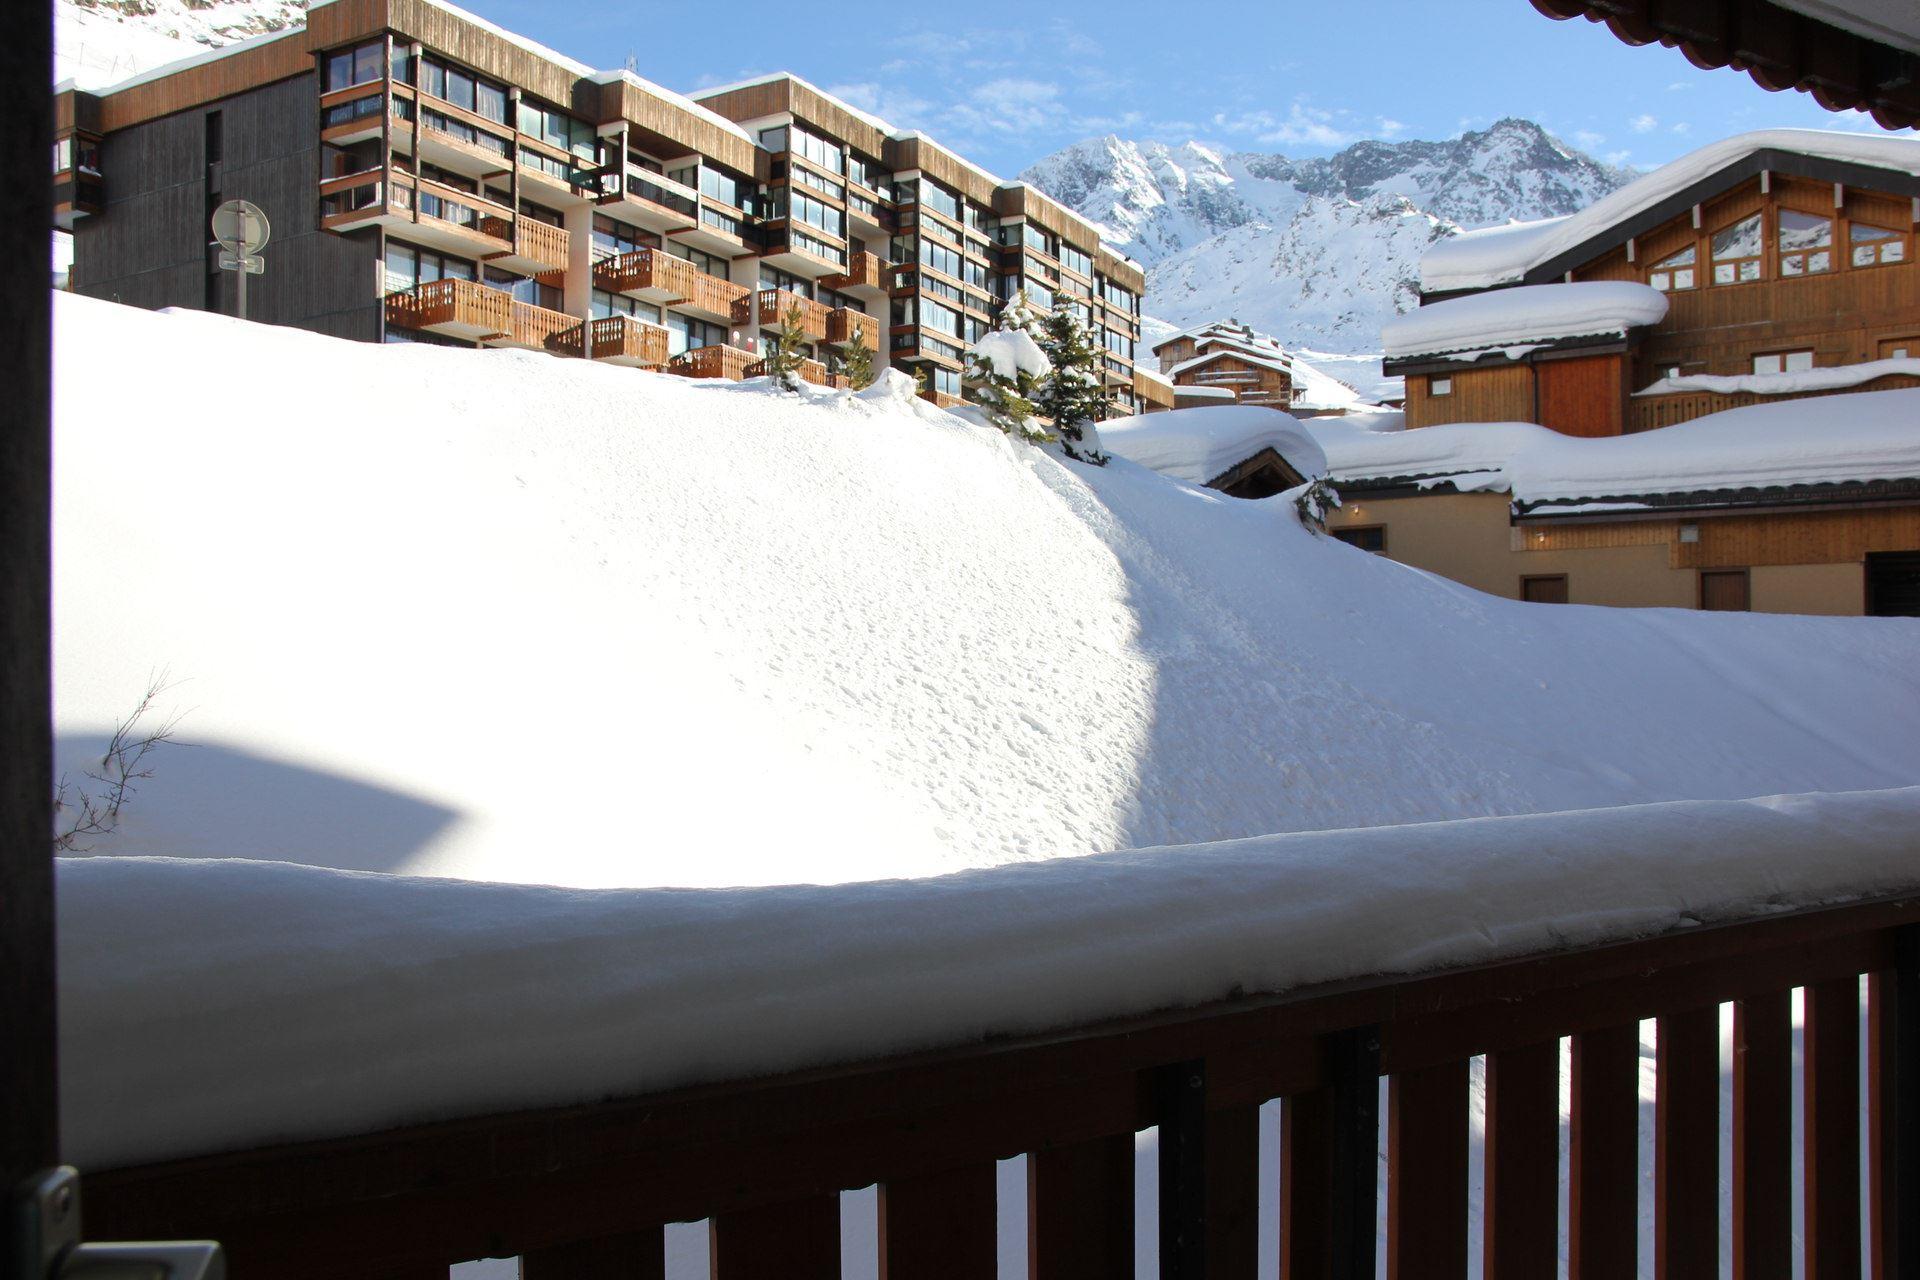 HAUTS DE LA VANOISE 314 / STUDIO 4 PERSONS - 2 SILVER SNOWFLAKES - CI